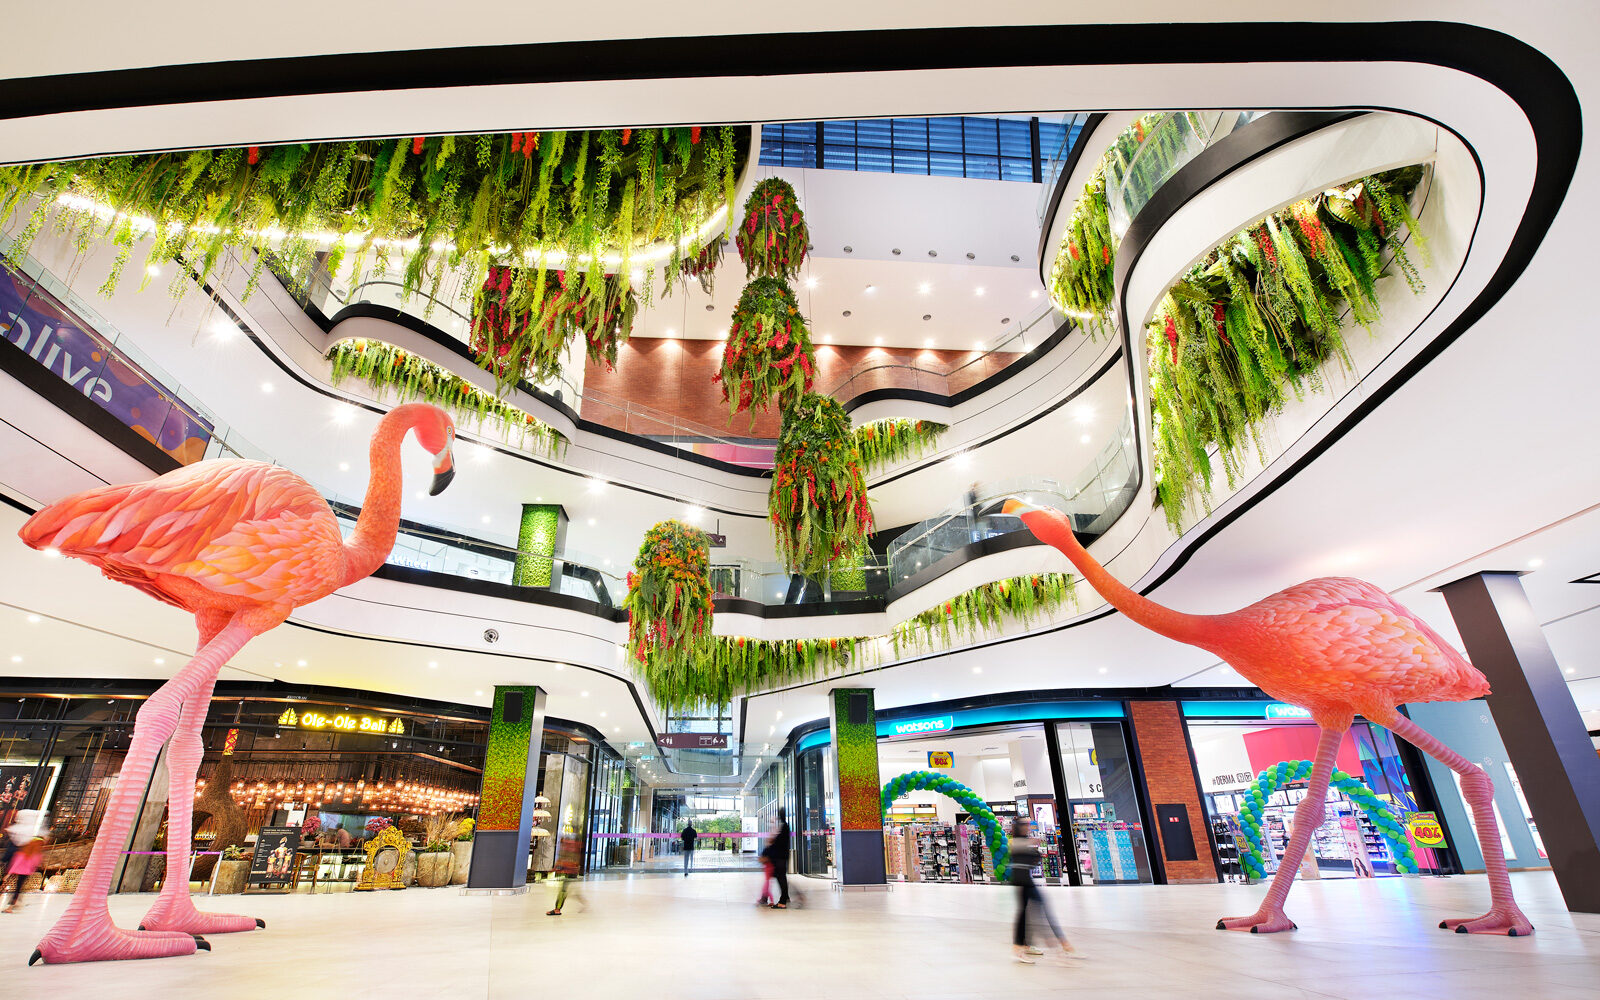 Quayside Mall